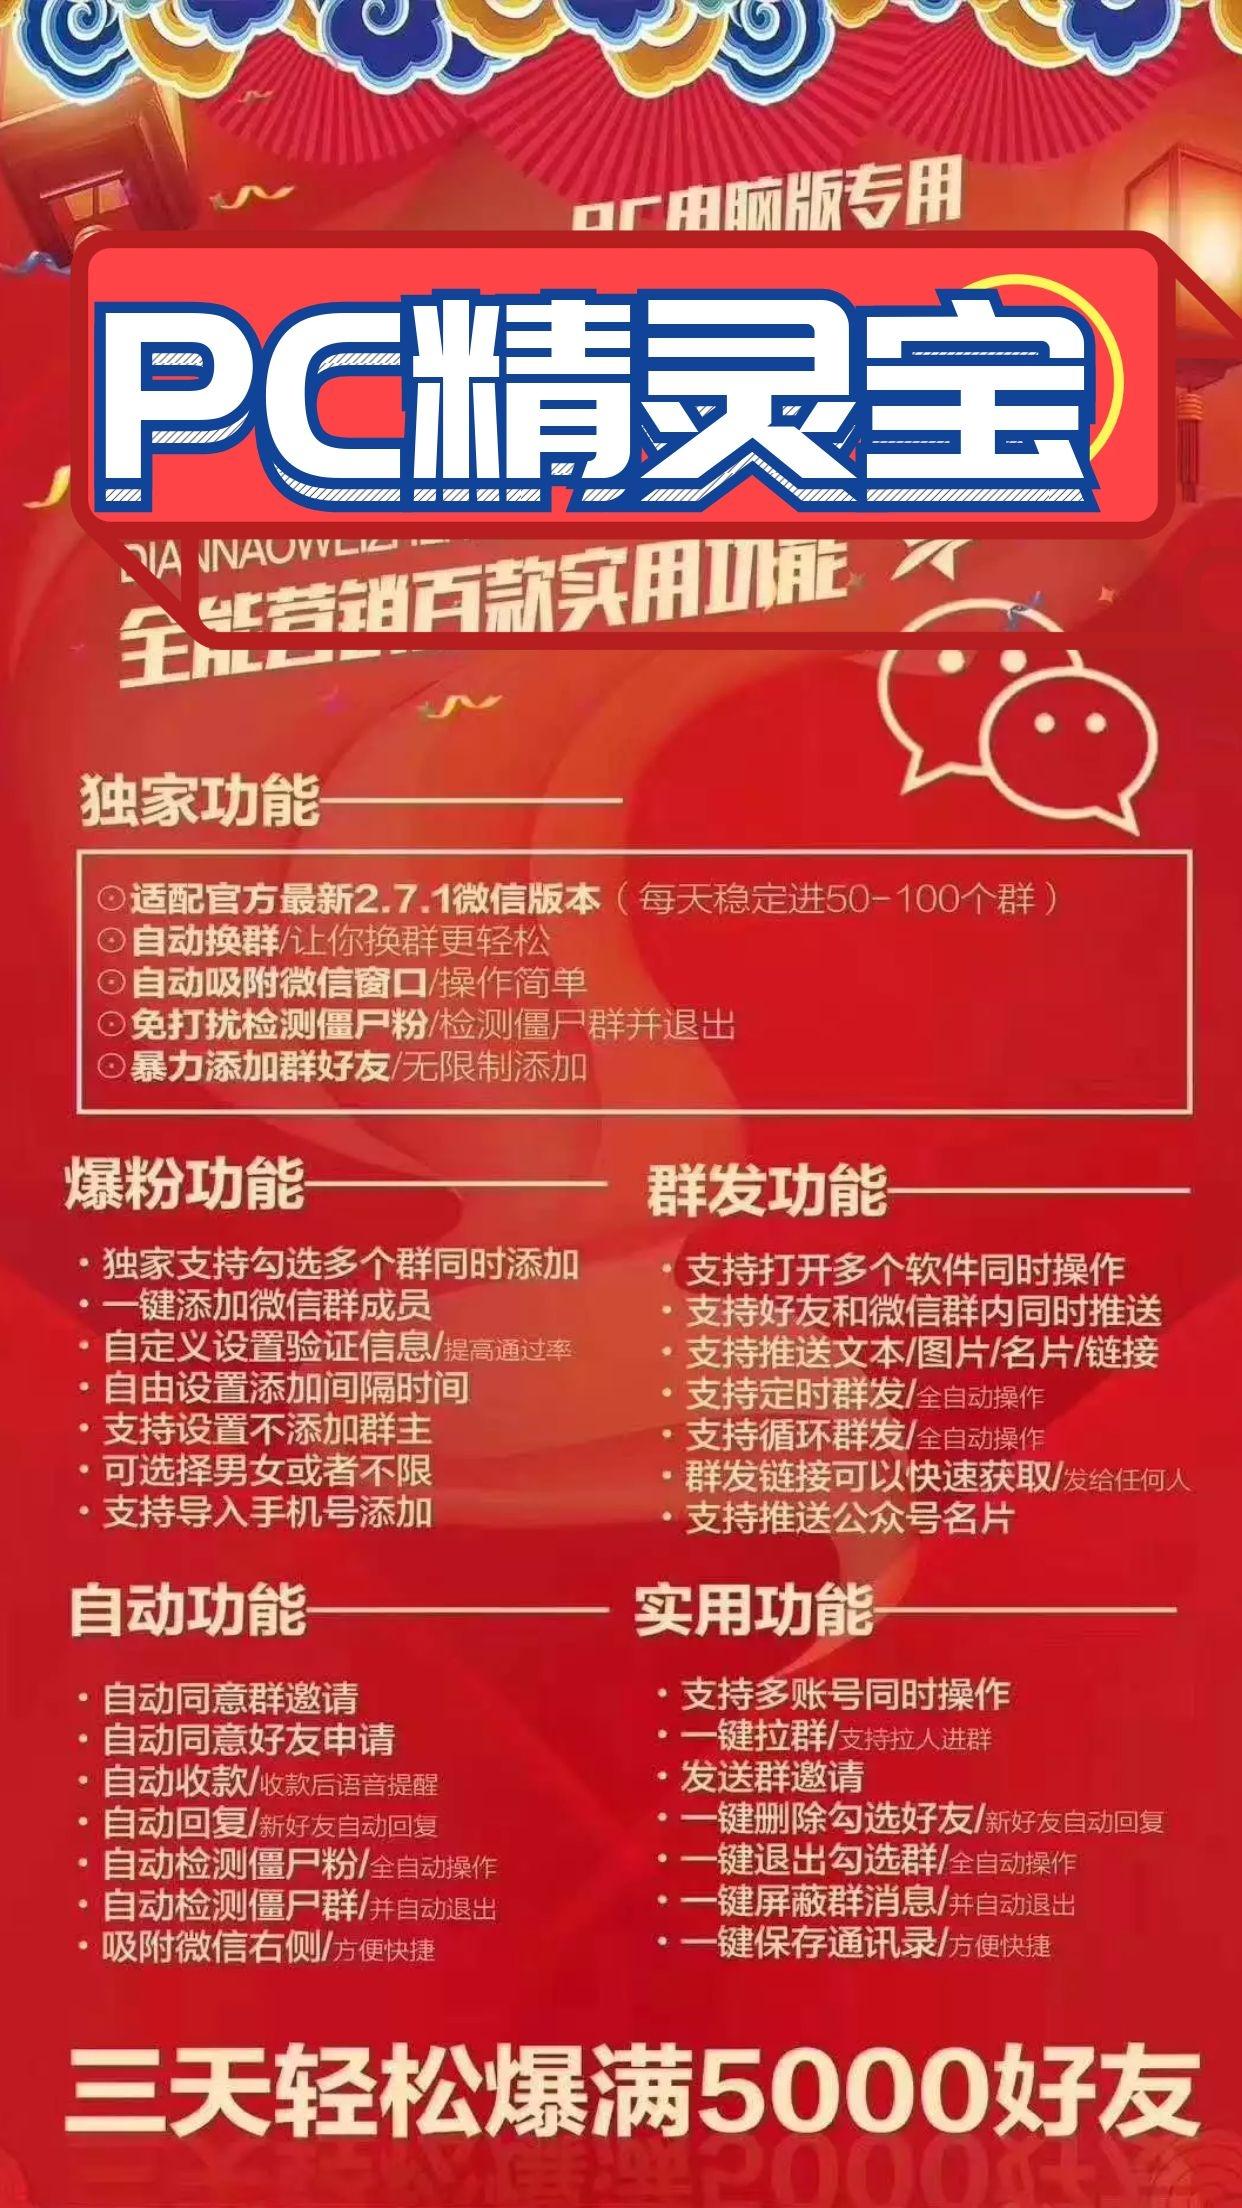 【PC精灵宝激活码】电脑版PC端微信多功能营销软件代理激活码授权